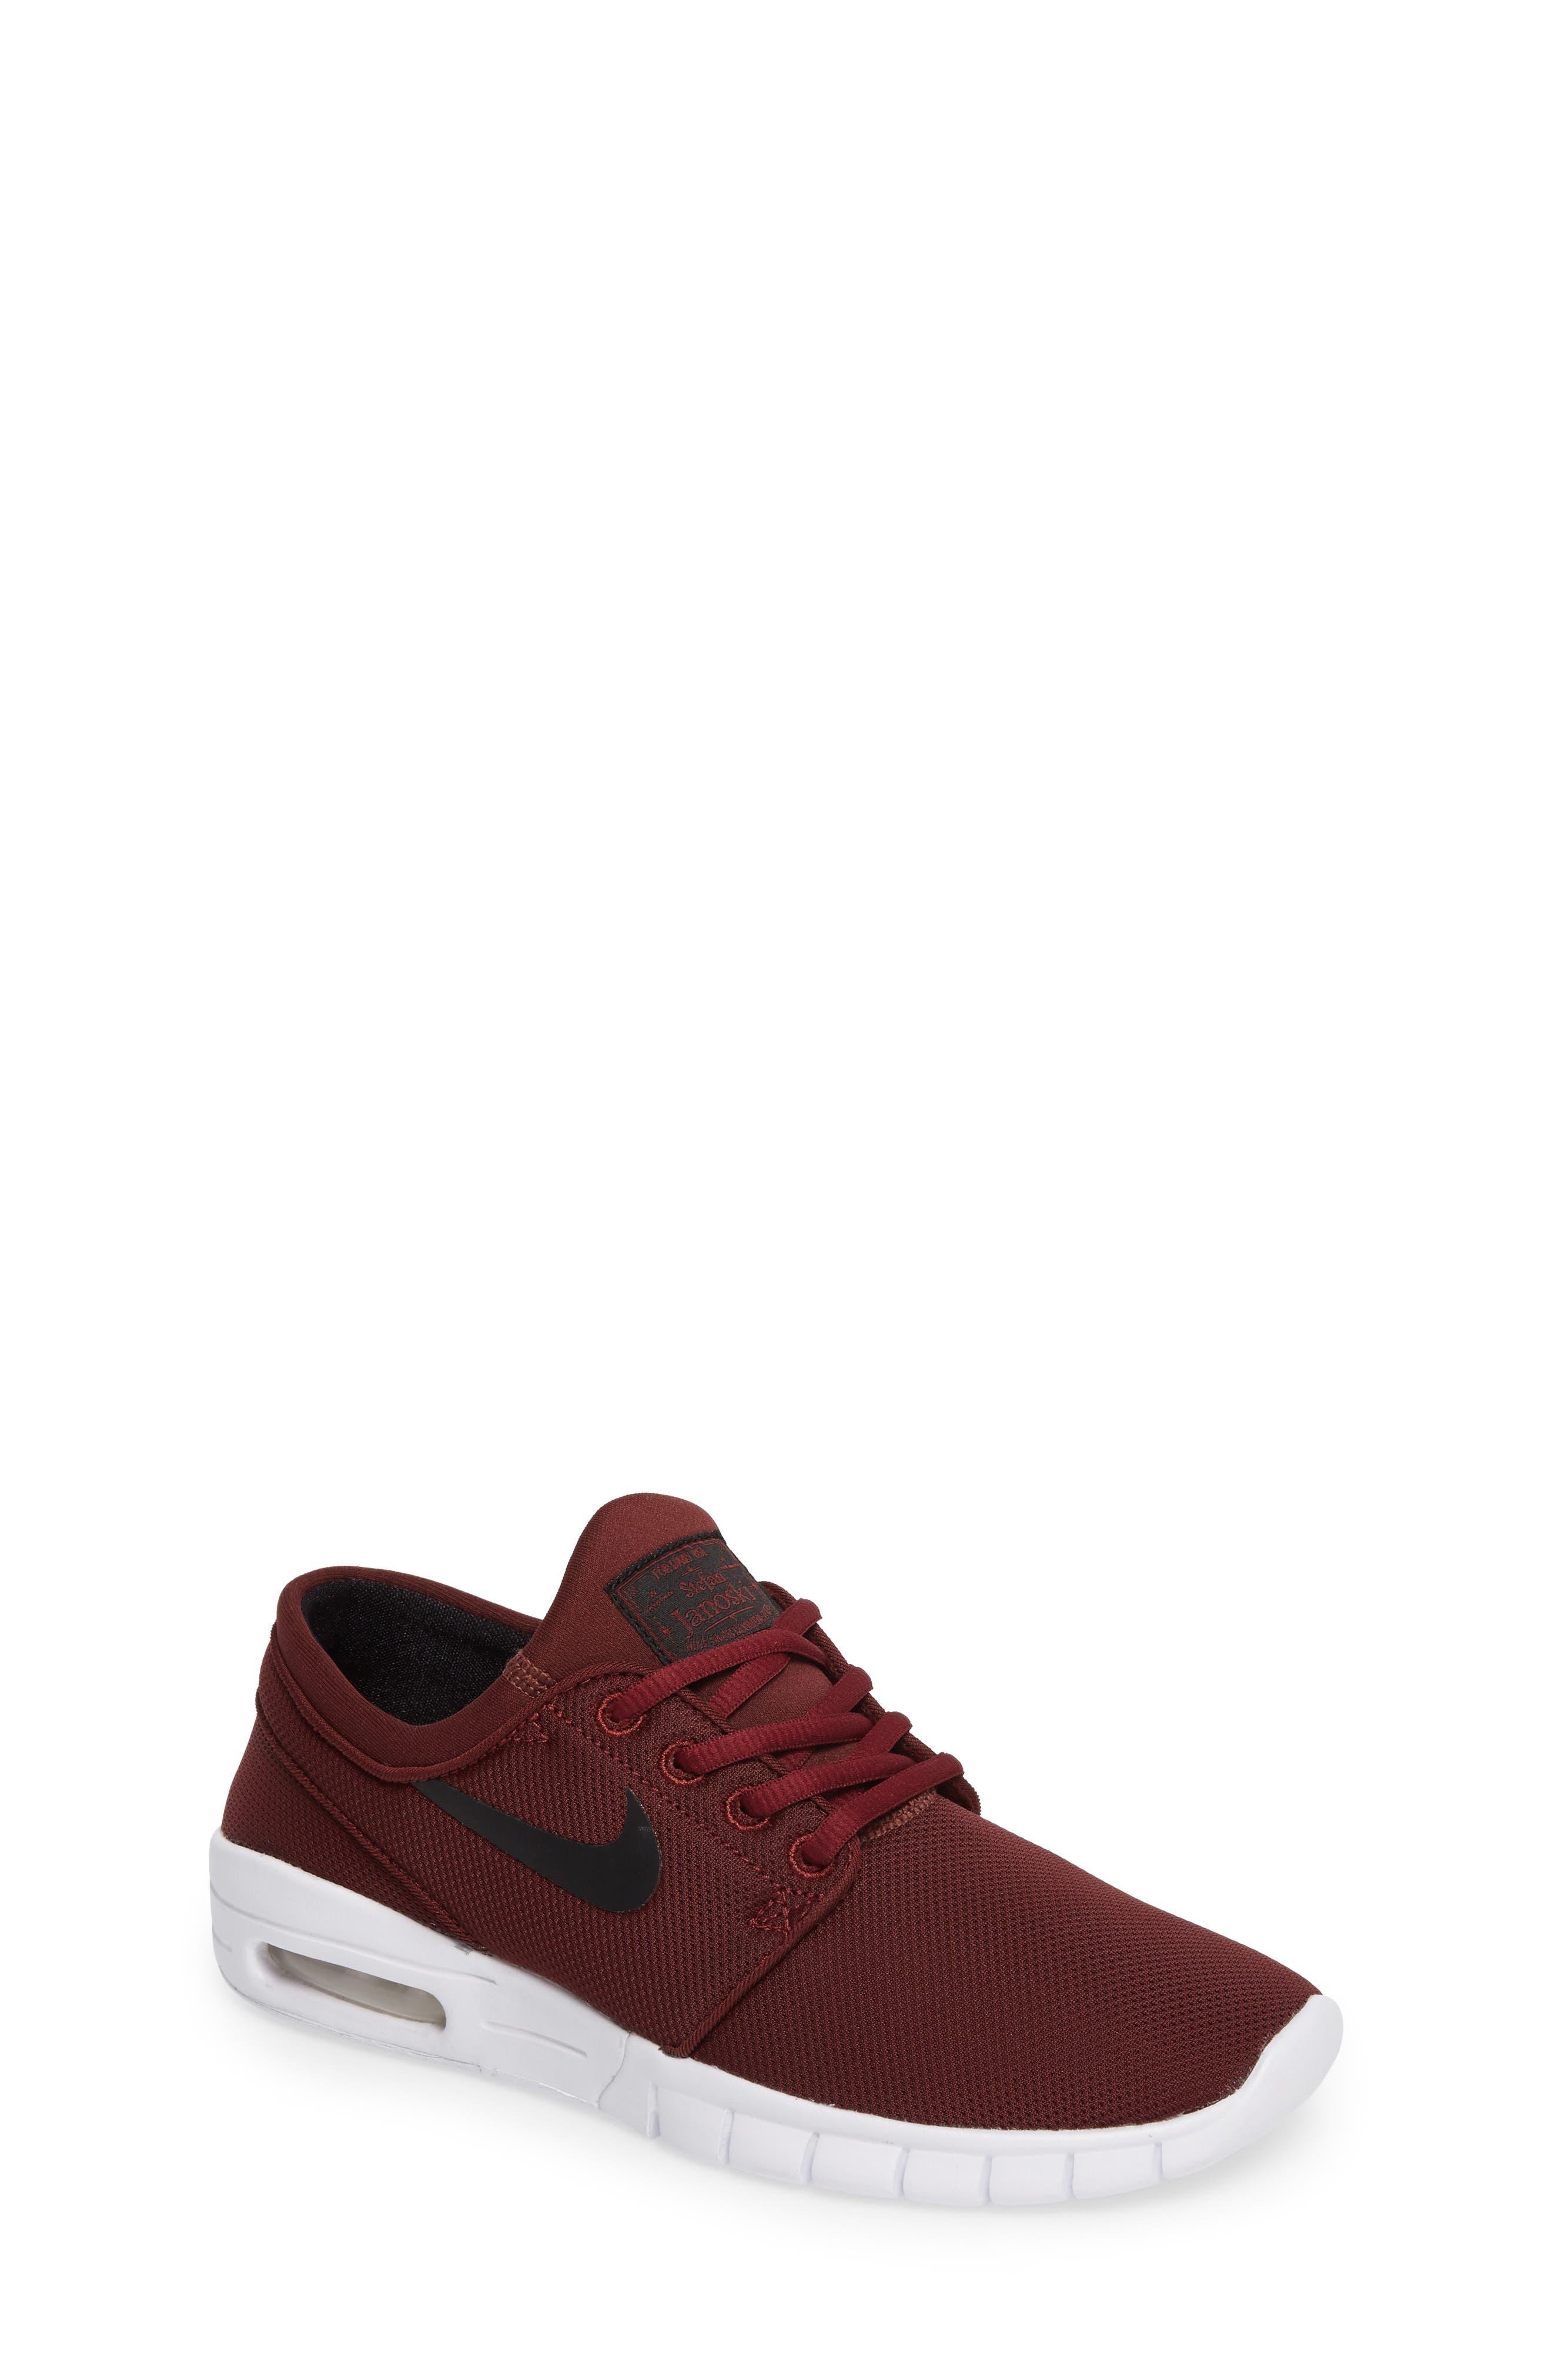 Stefan Janoski Max SB Skate Sneaker,                             Main thumbnail 9, color,